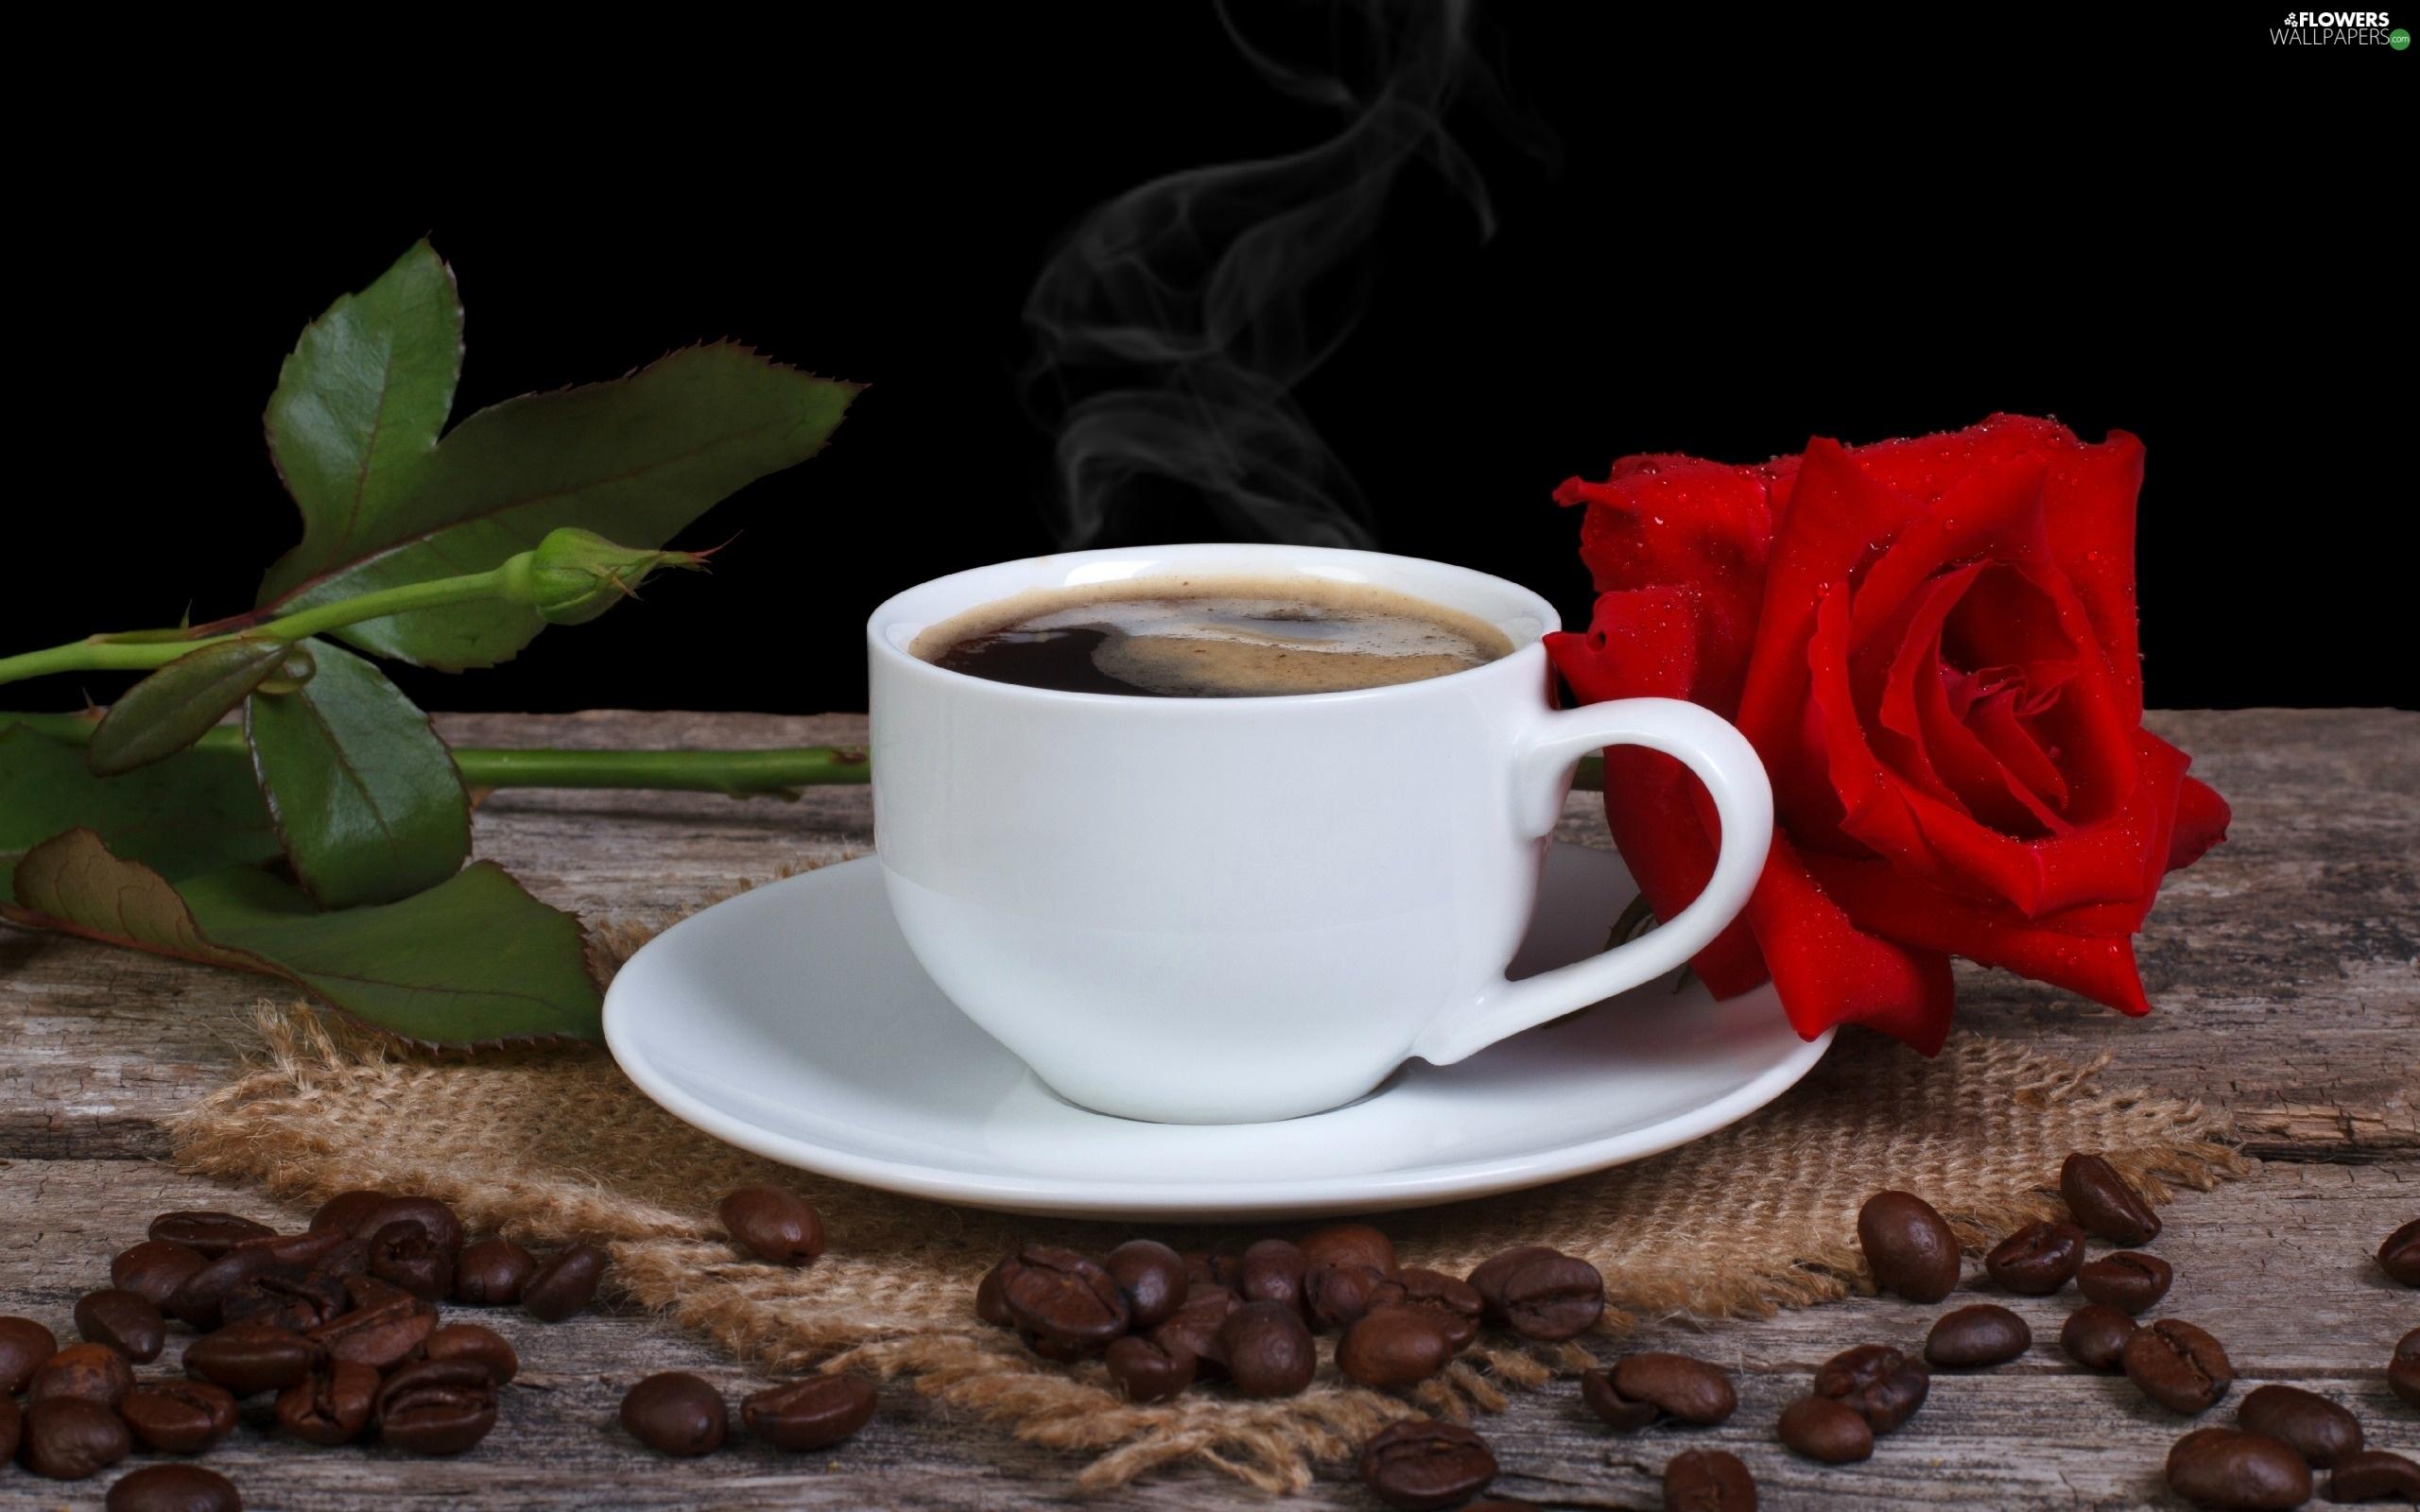 Lovely Red Rose Cafe